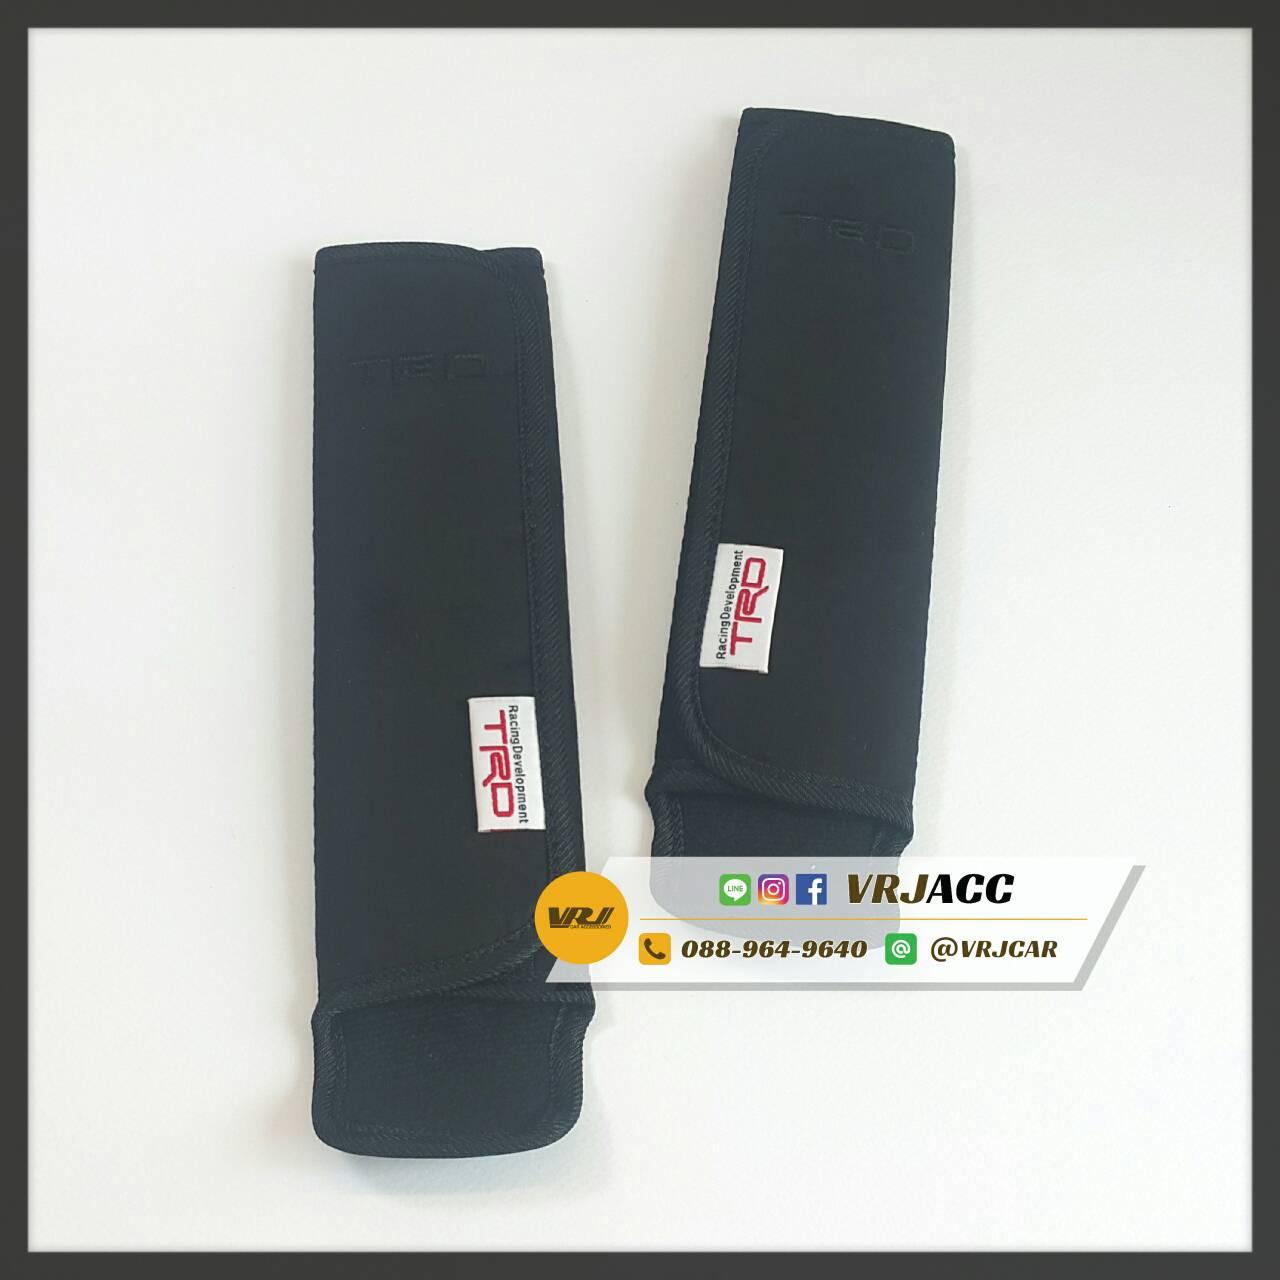 TRD หุ้มเบลท์ หุ้มสายรัดเข็มขัดนิรภัย Seat belt Cover